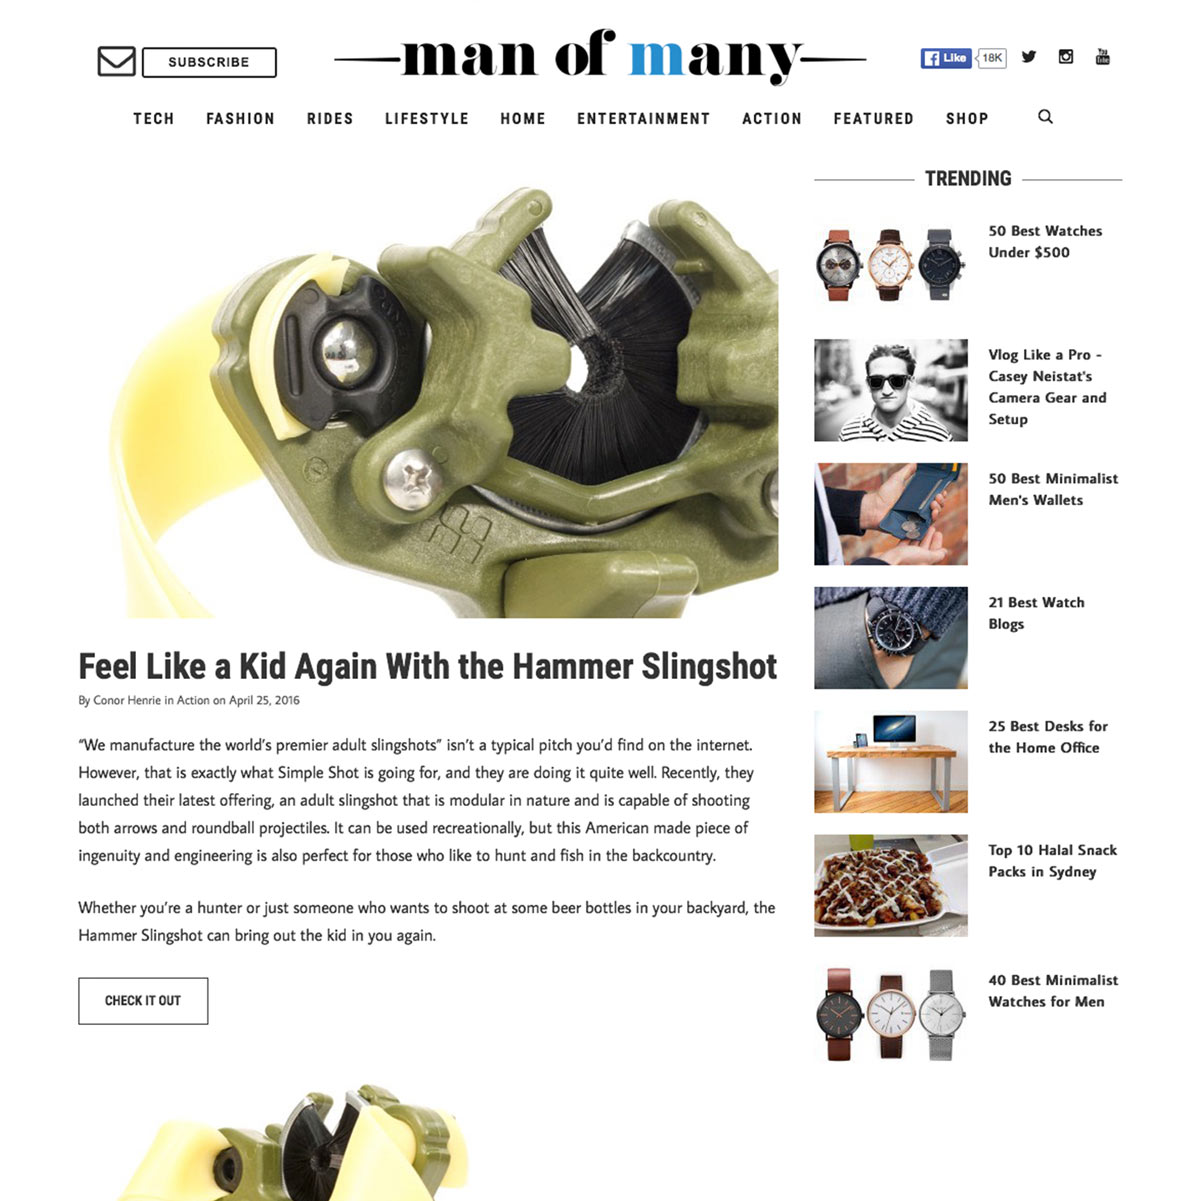 Man of Many Hammer Slingshot / Slingbow Review